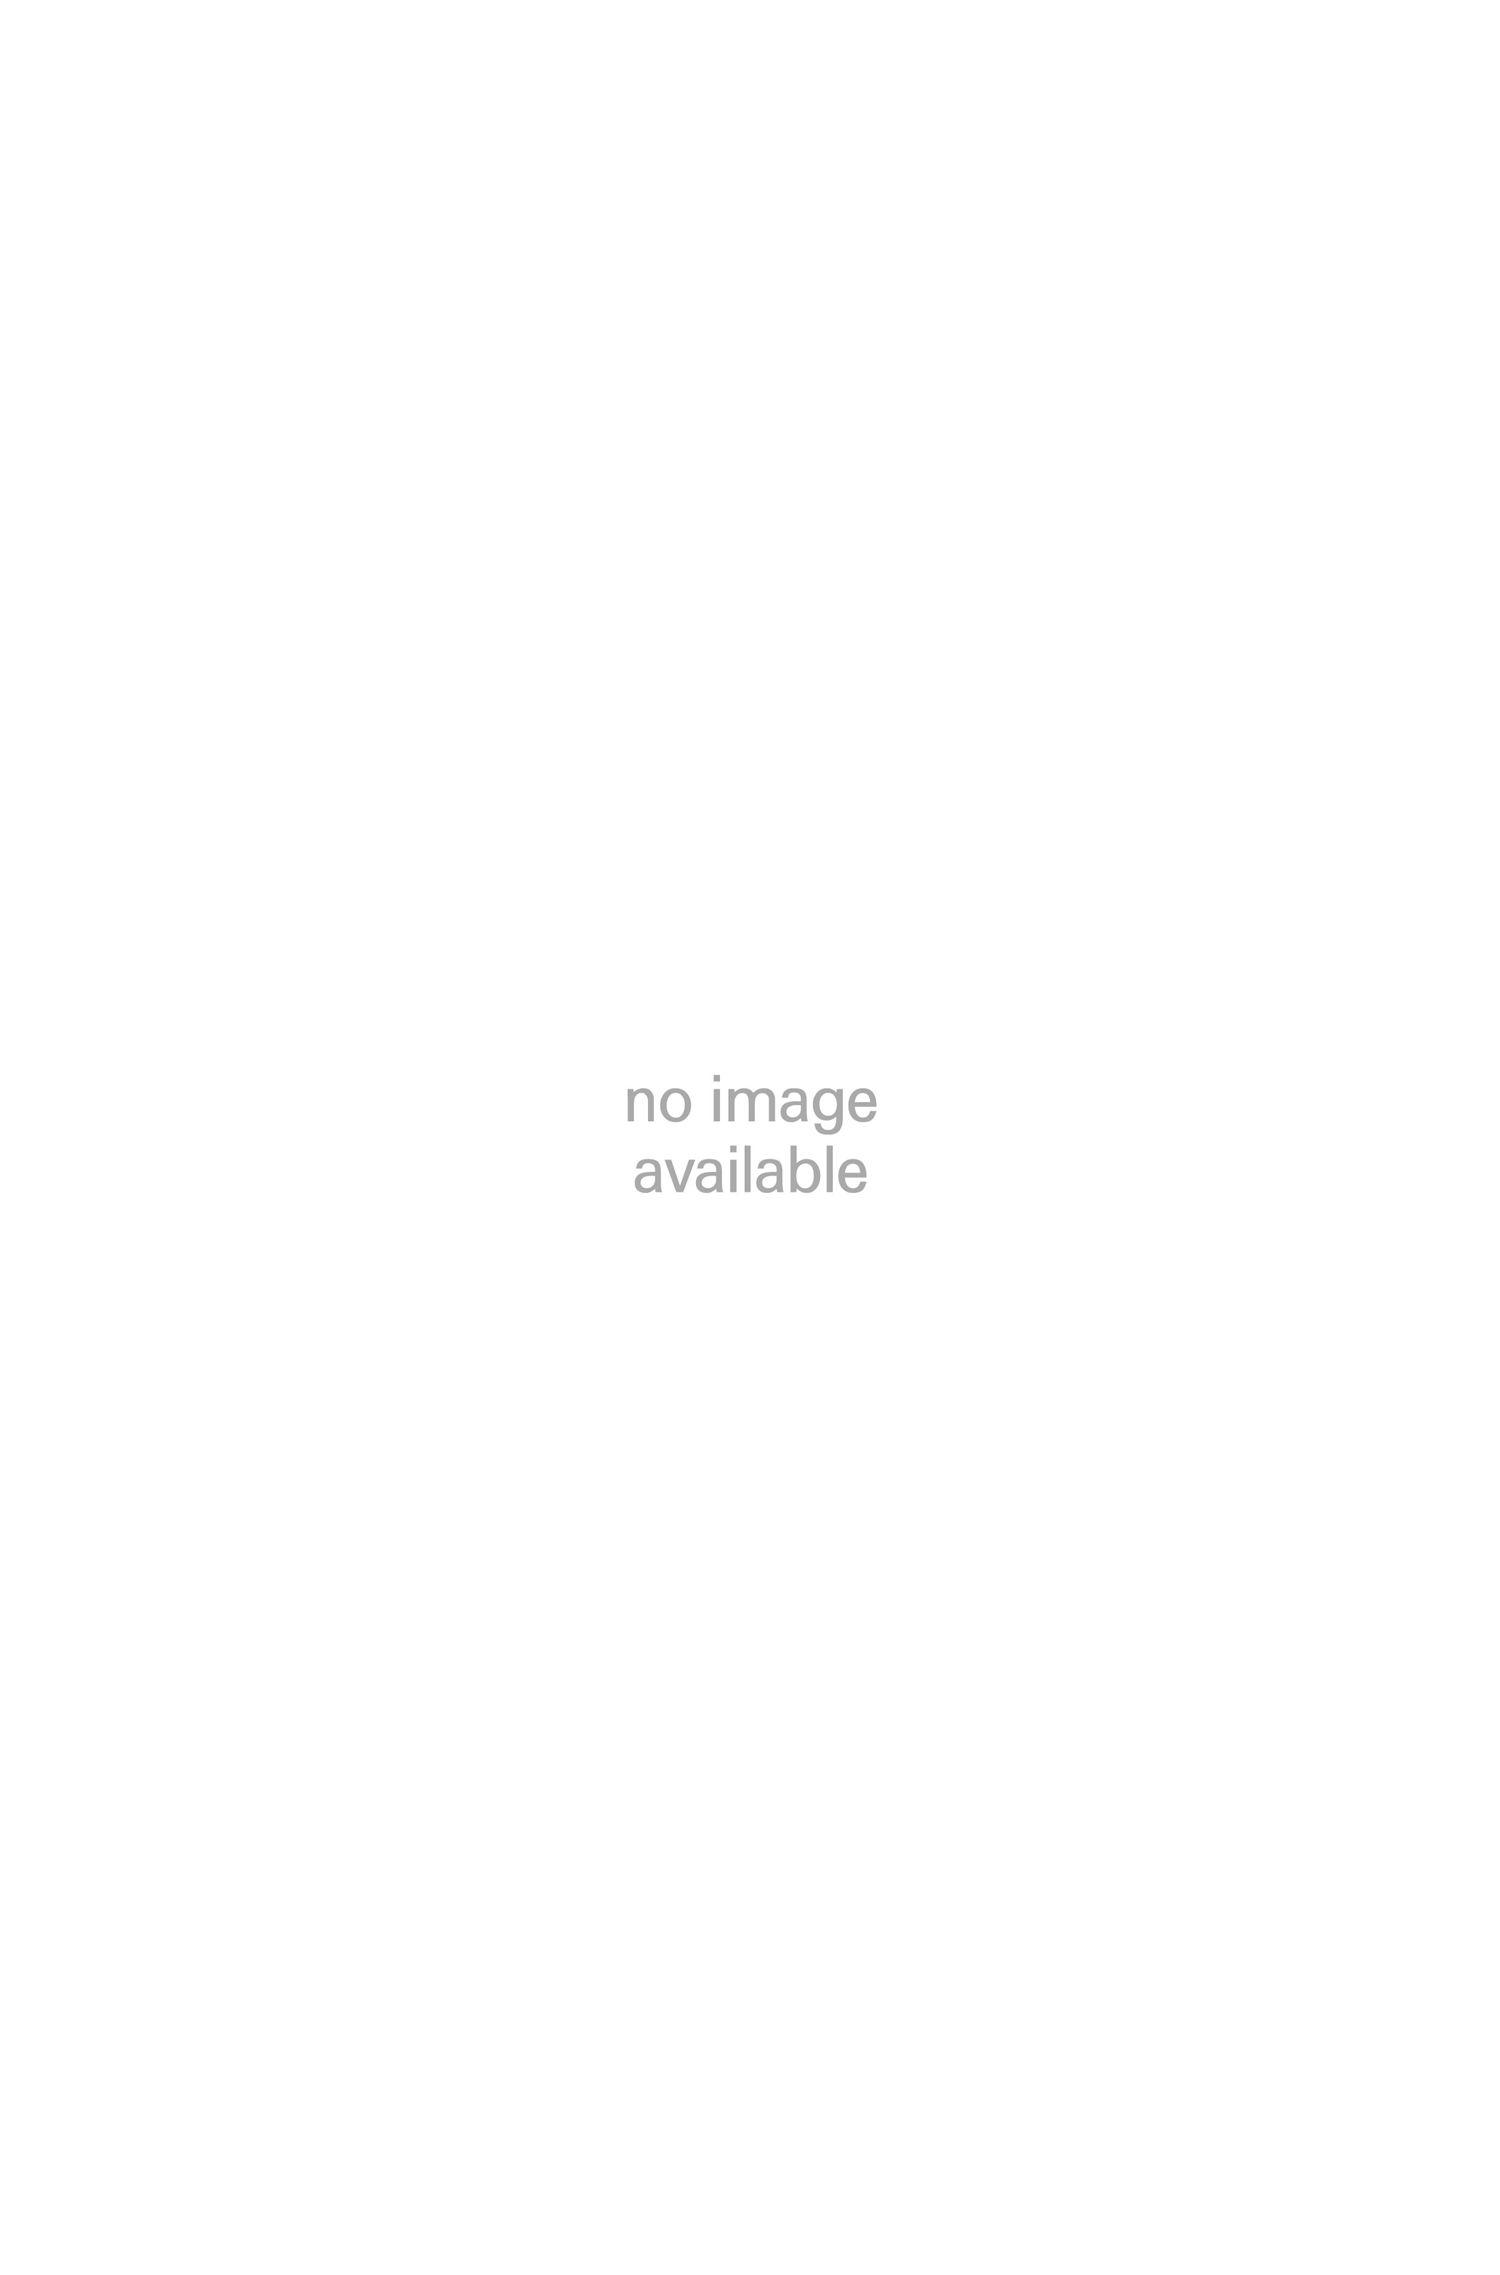 'HUGO ' | 4.2 fl. oz. (125 mL) Eau de Toilette